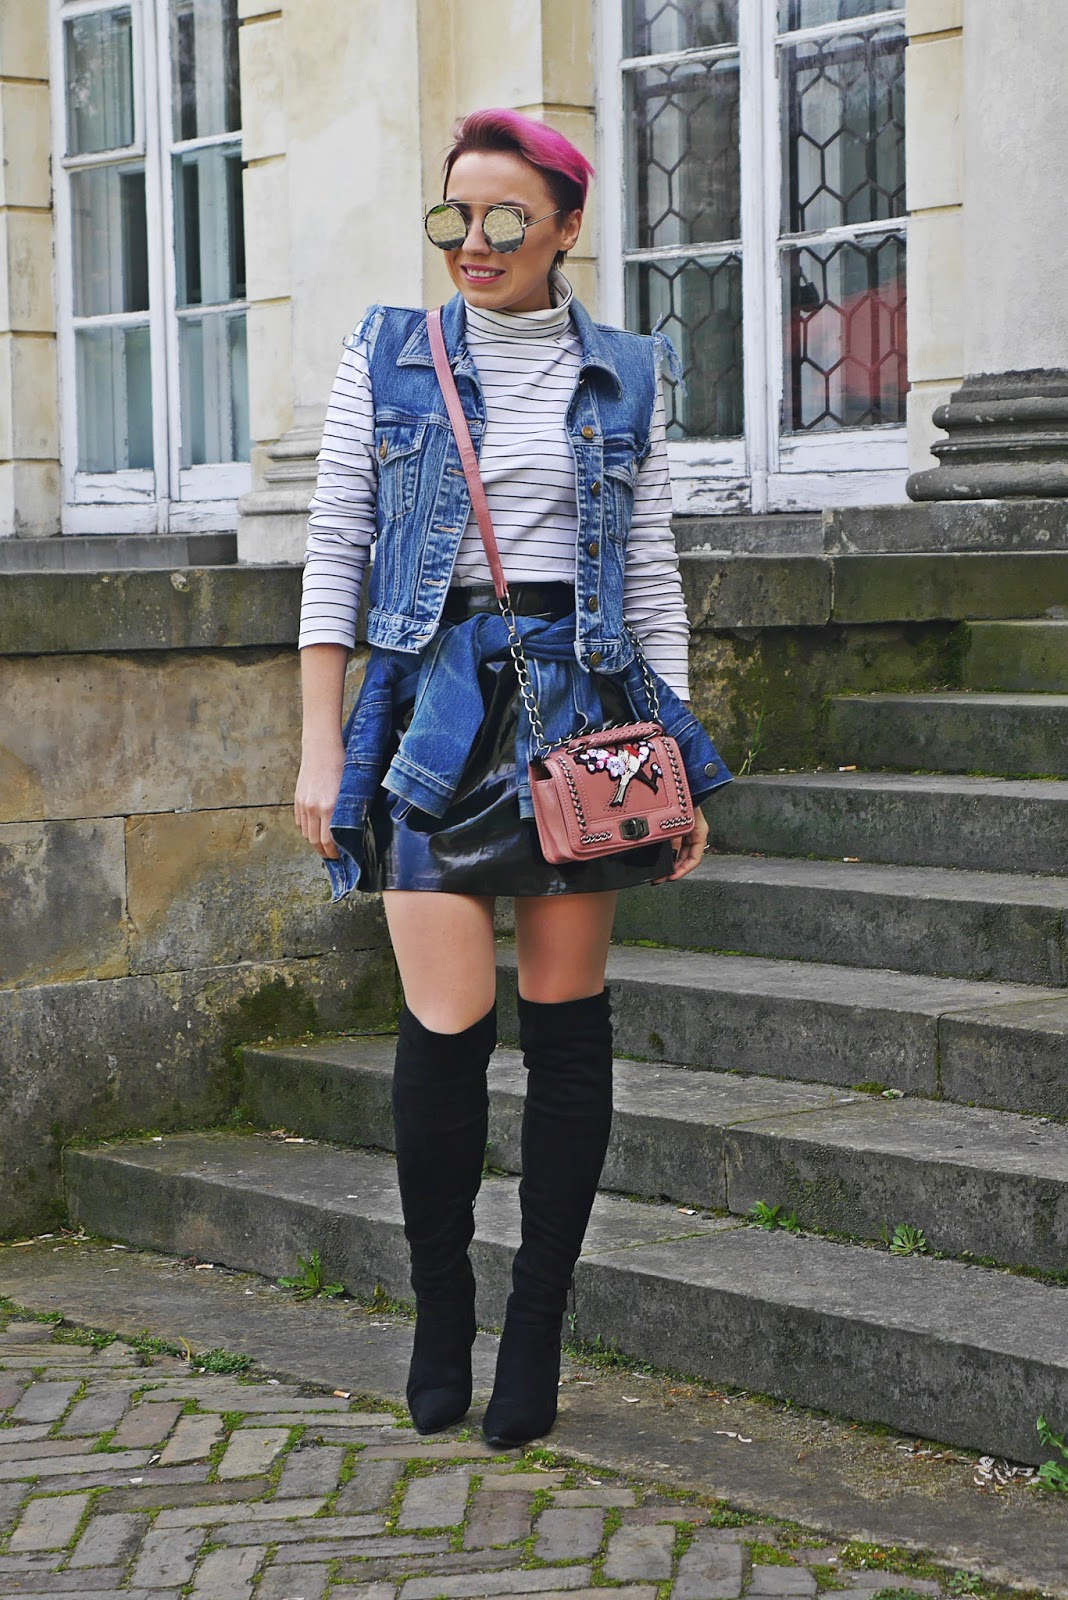 blogerka_modowa_blog_modowy_karyn_pulawy_look_ootd_220417b